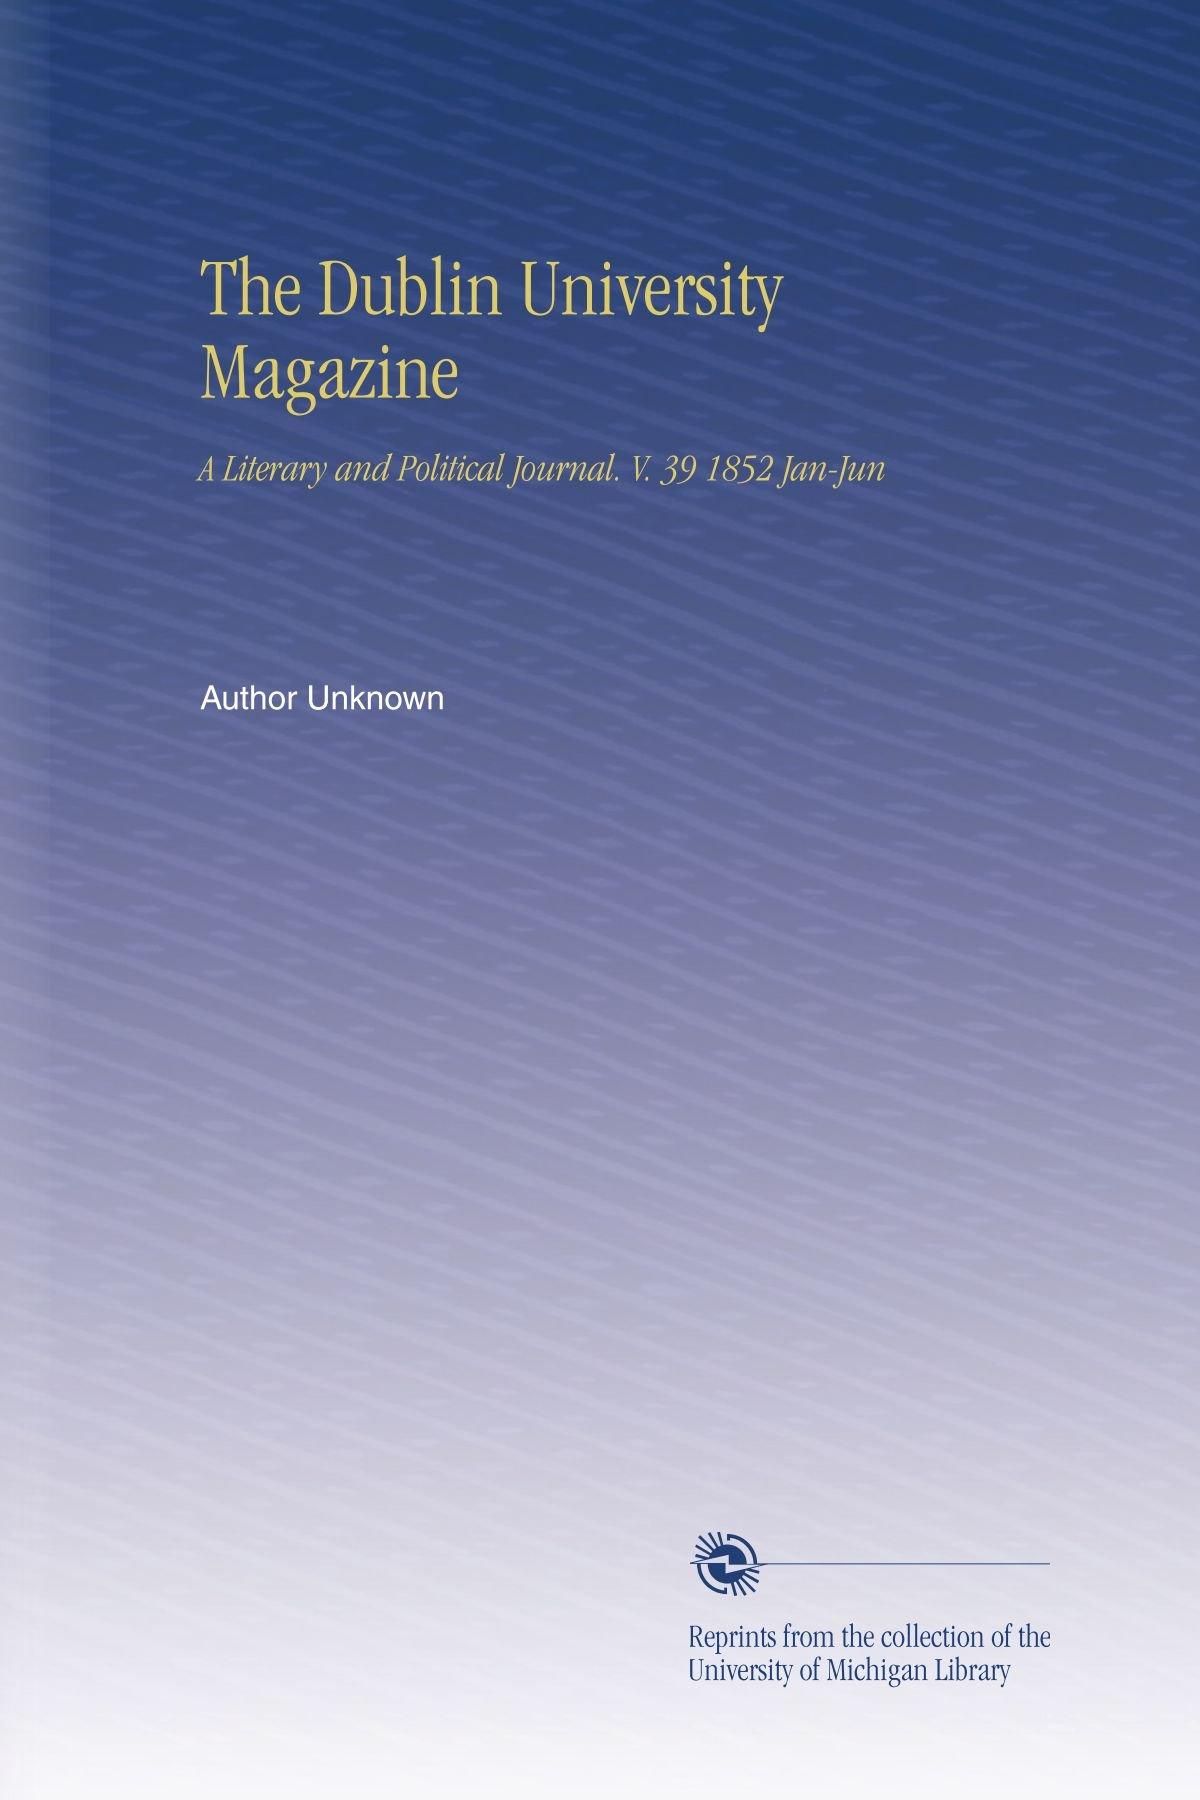 The Dublin University Magazine: A Literary and Political Journal. V. 39 1852 Jan-Jun ebook